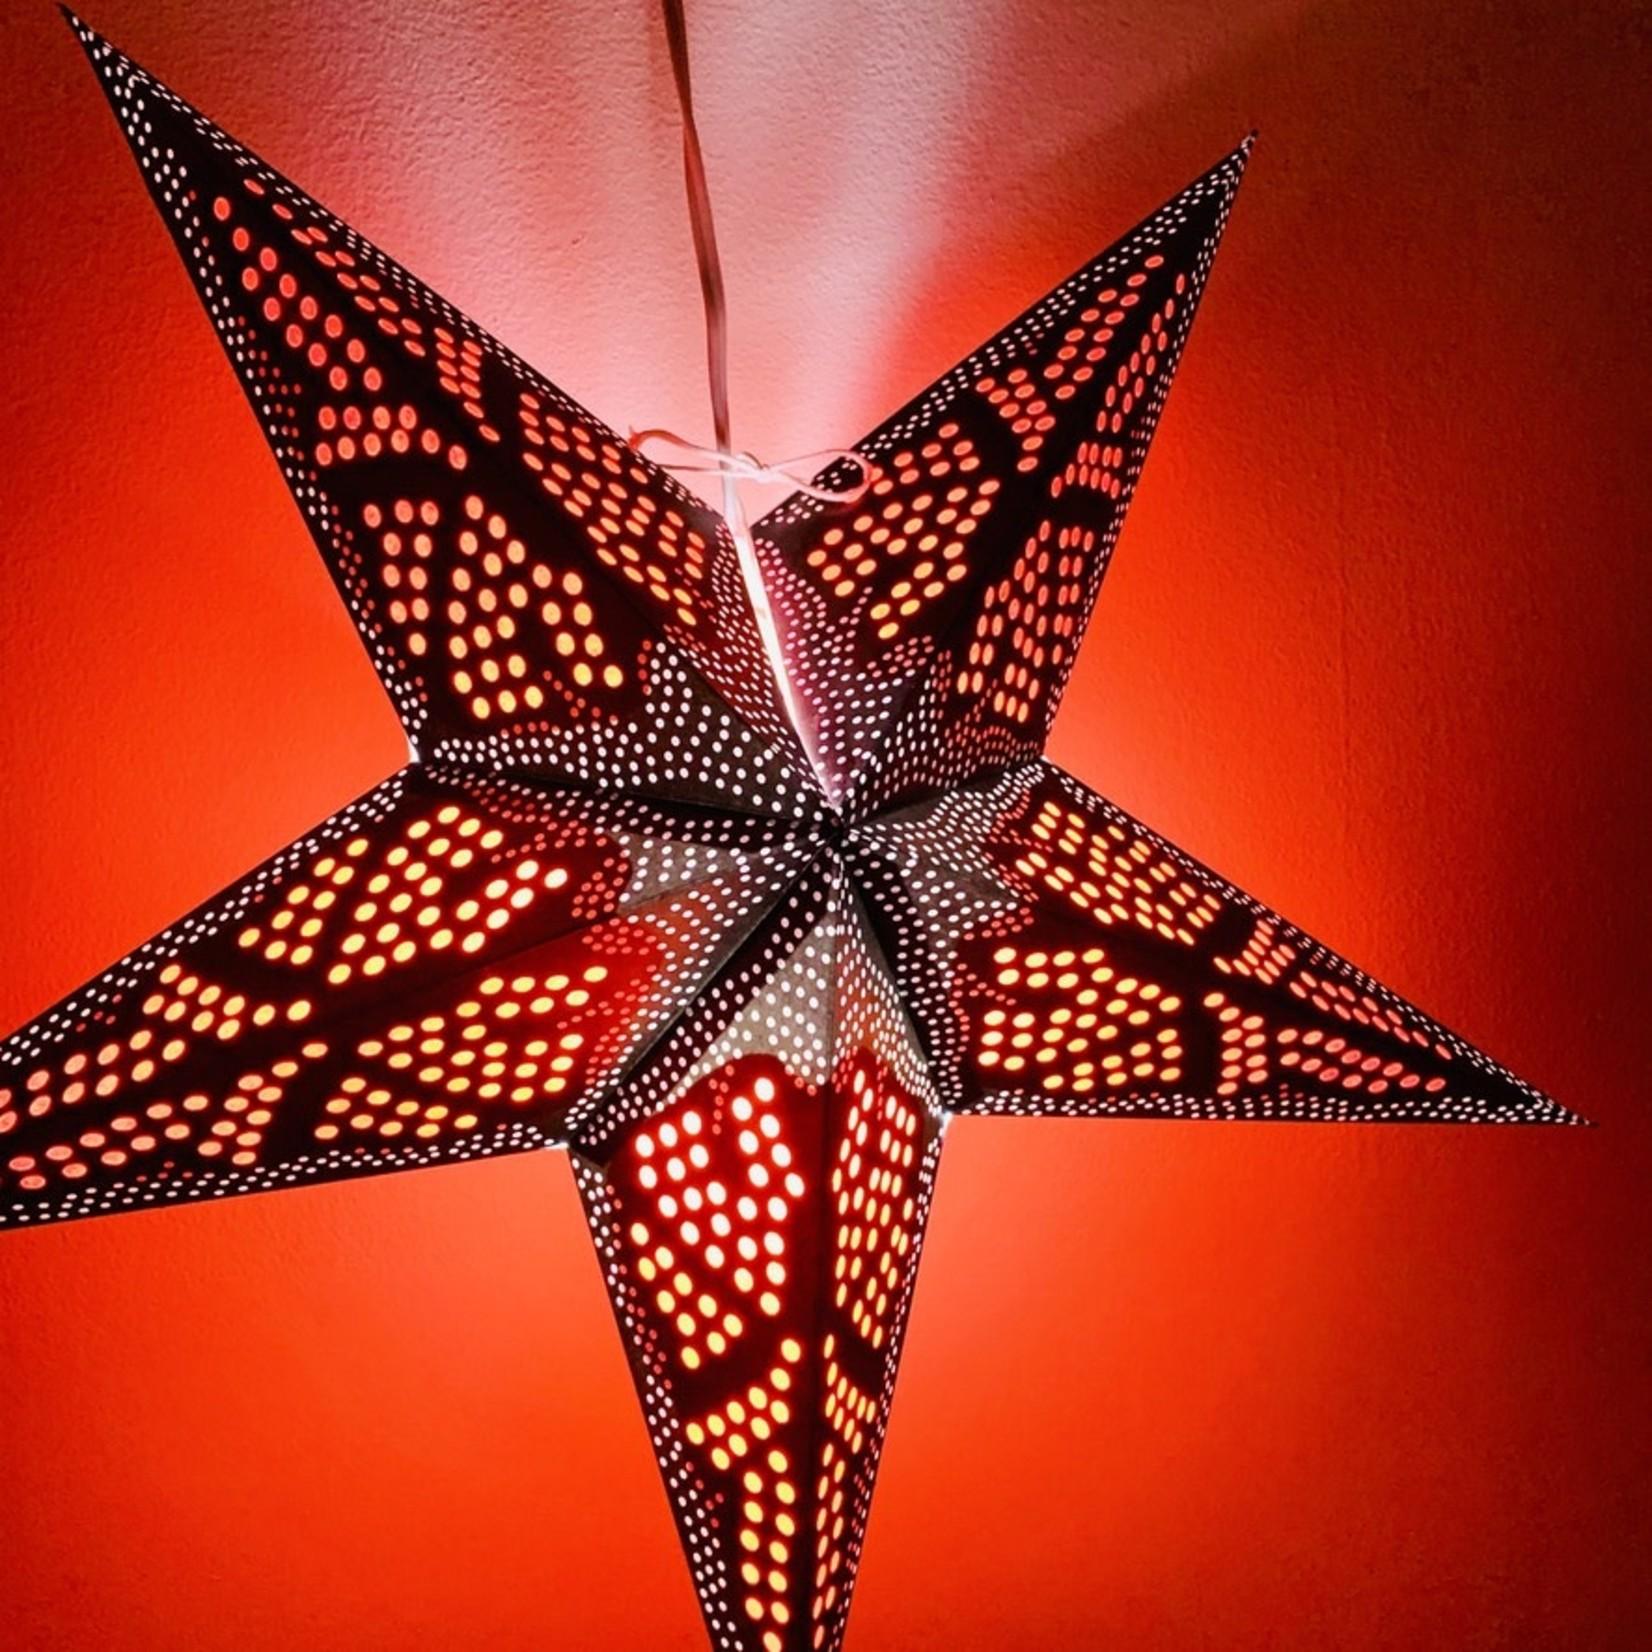 Mariana Star Light with 12' Cord